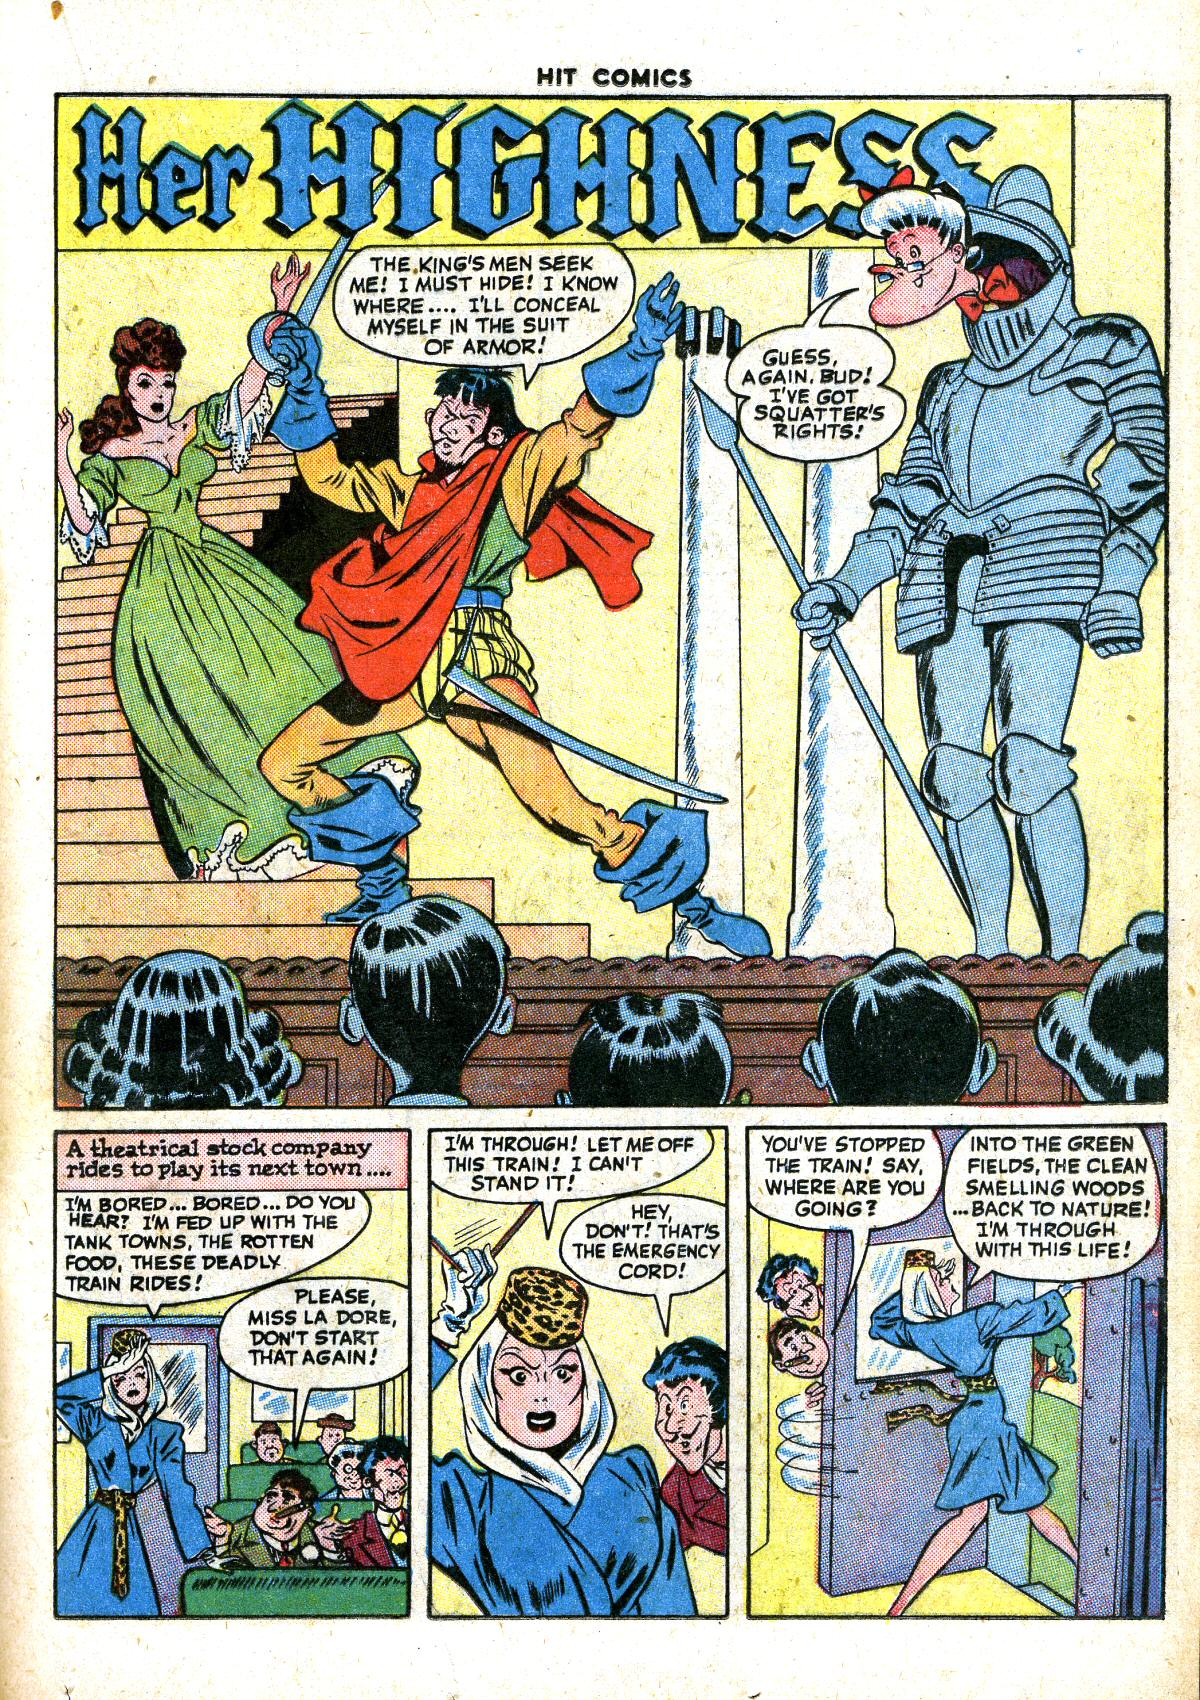 Read online Hit Comics comic -  Issue #41 - 25